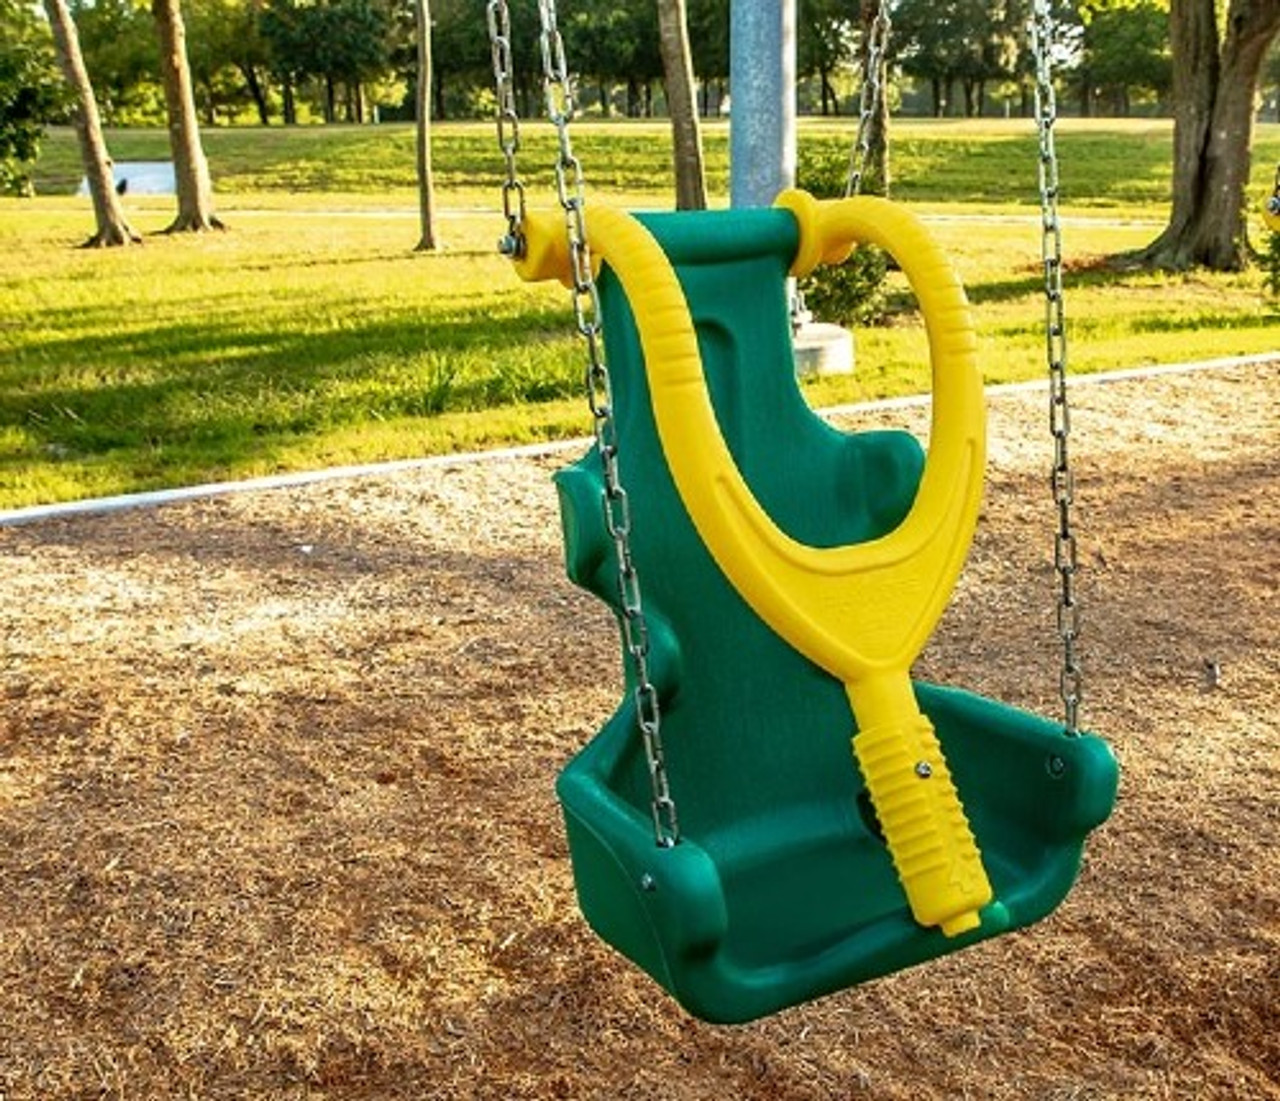 Inclusive Swing Seat Green-Yellow